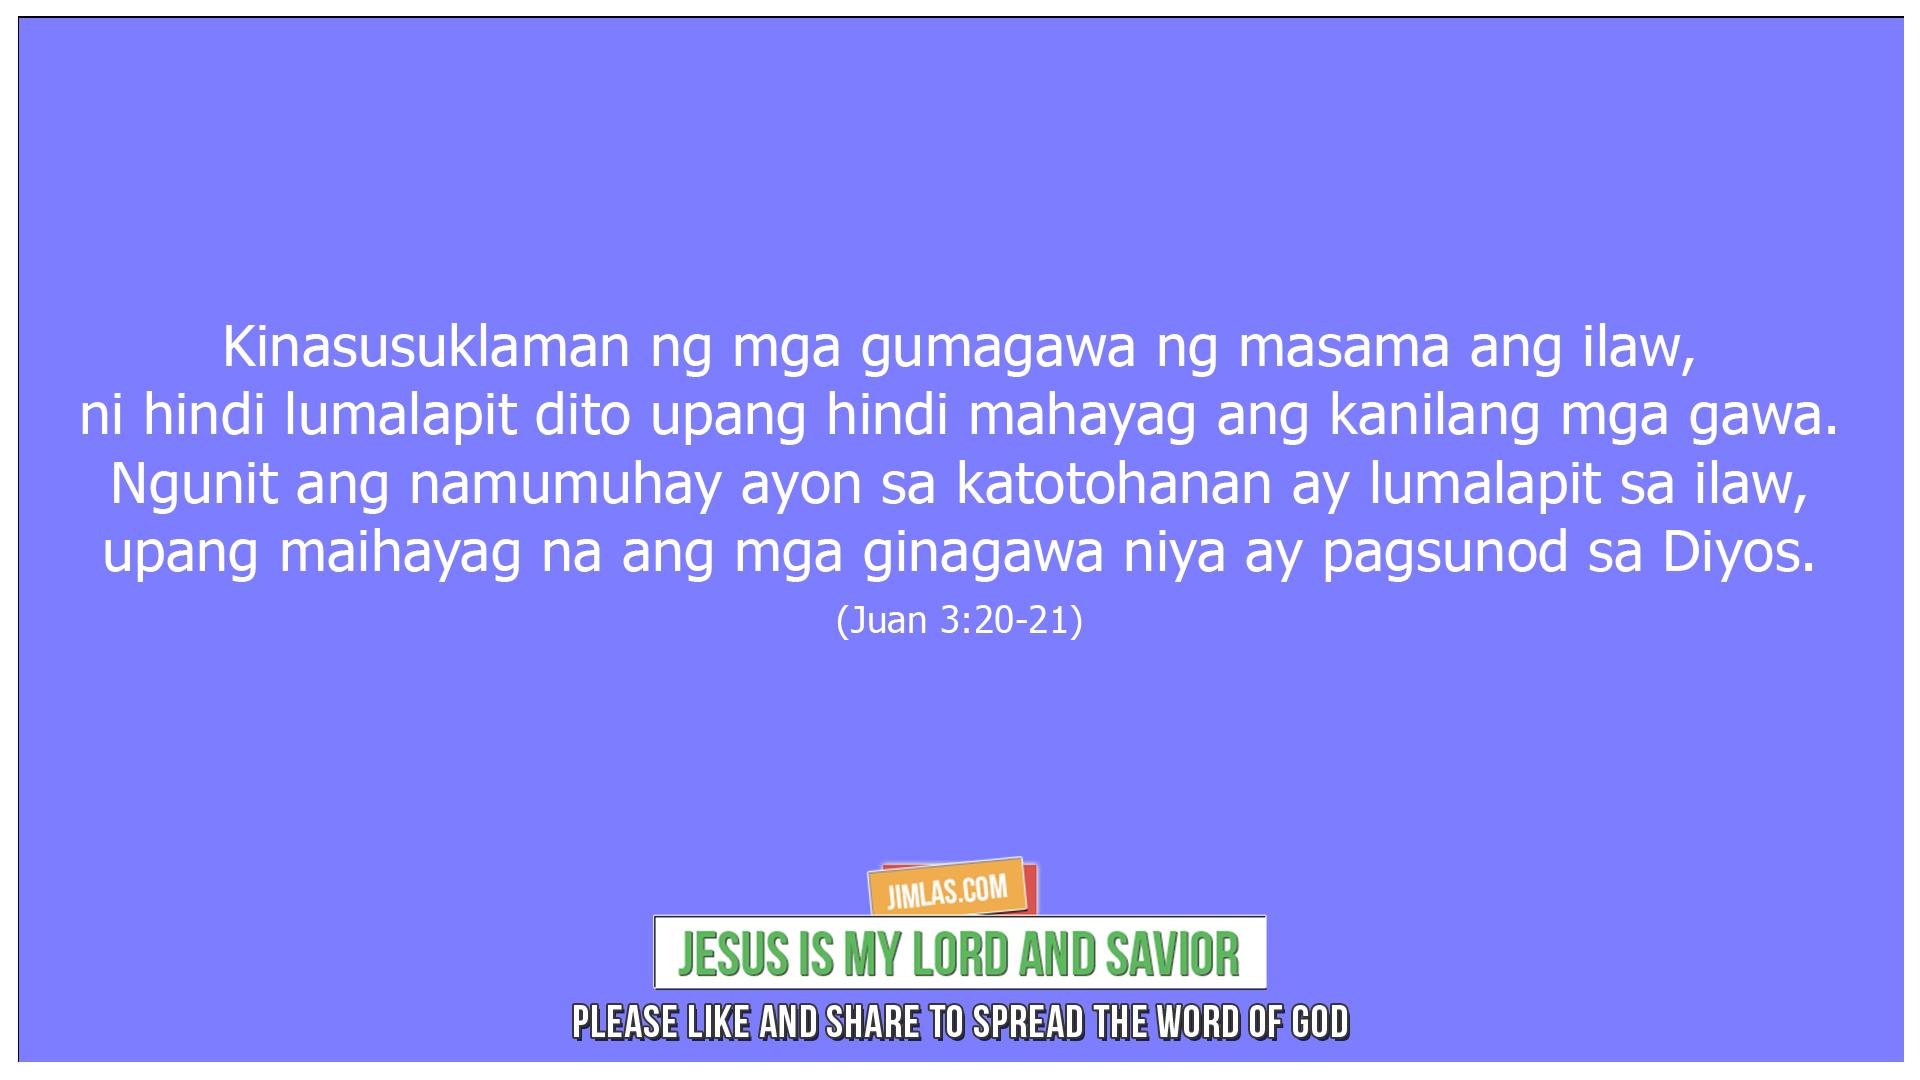 Juan 3 20-21, Juan 3:20-21